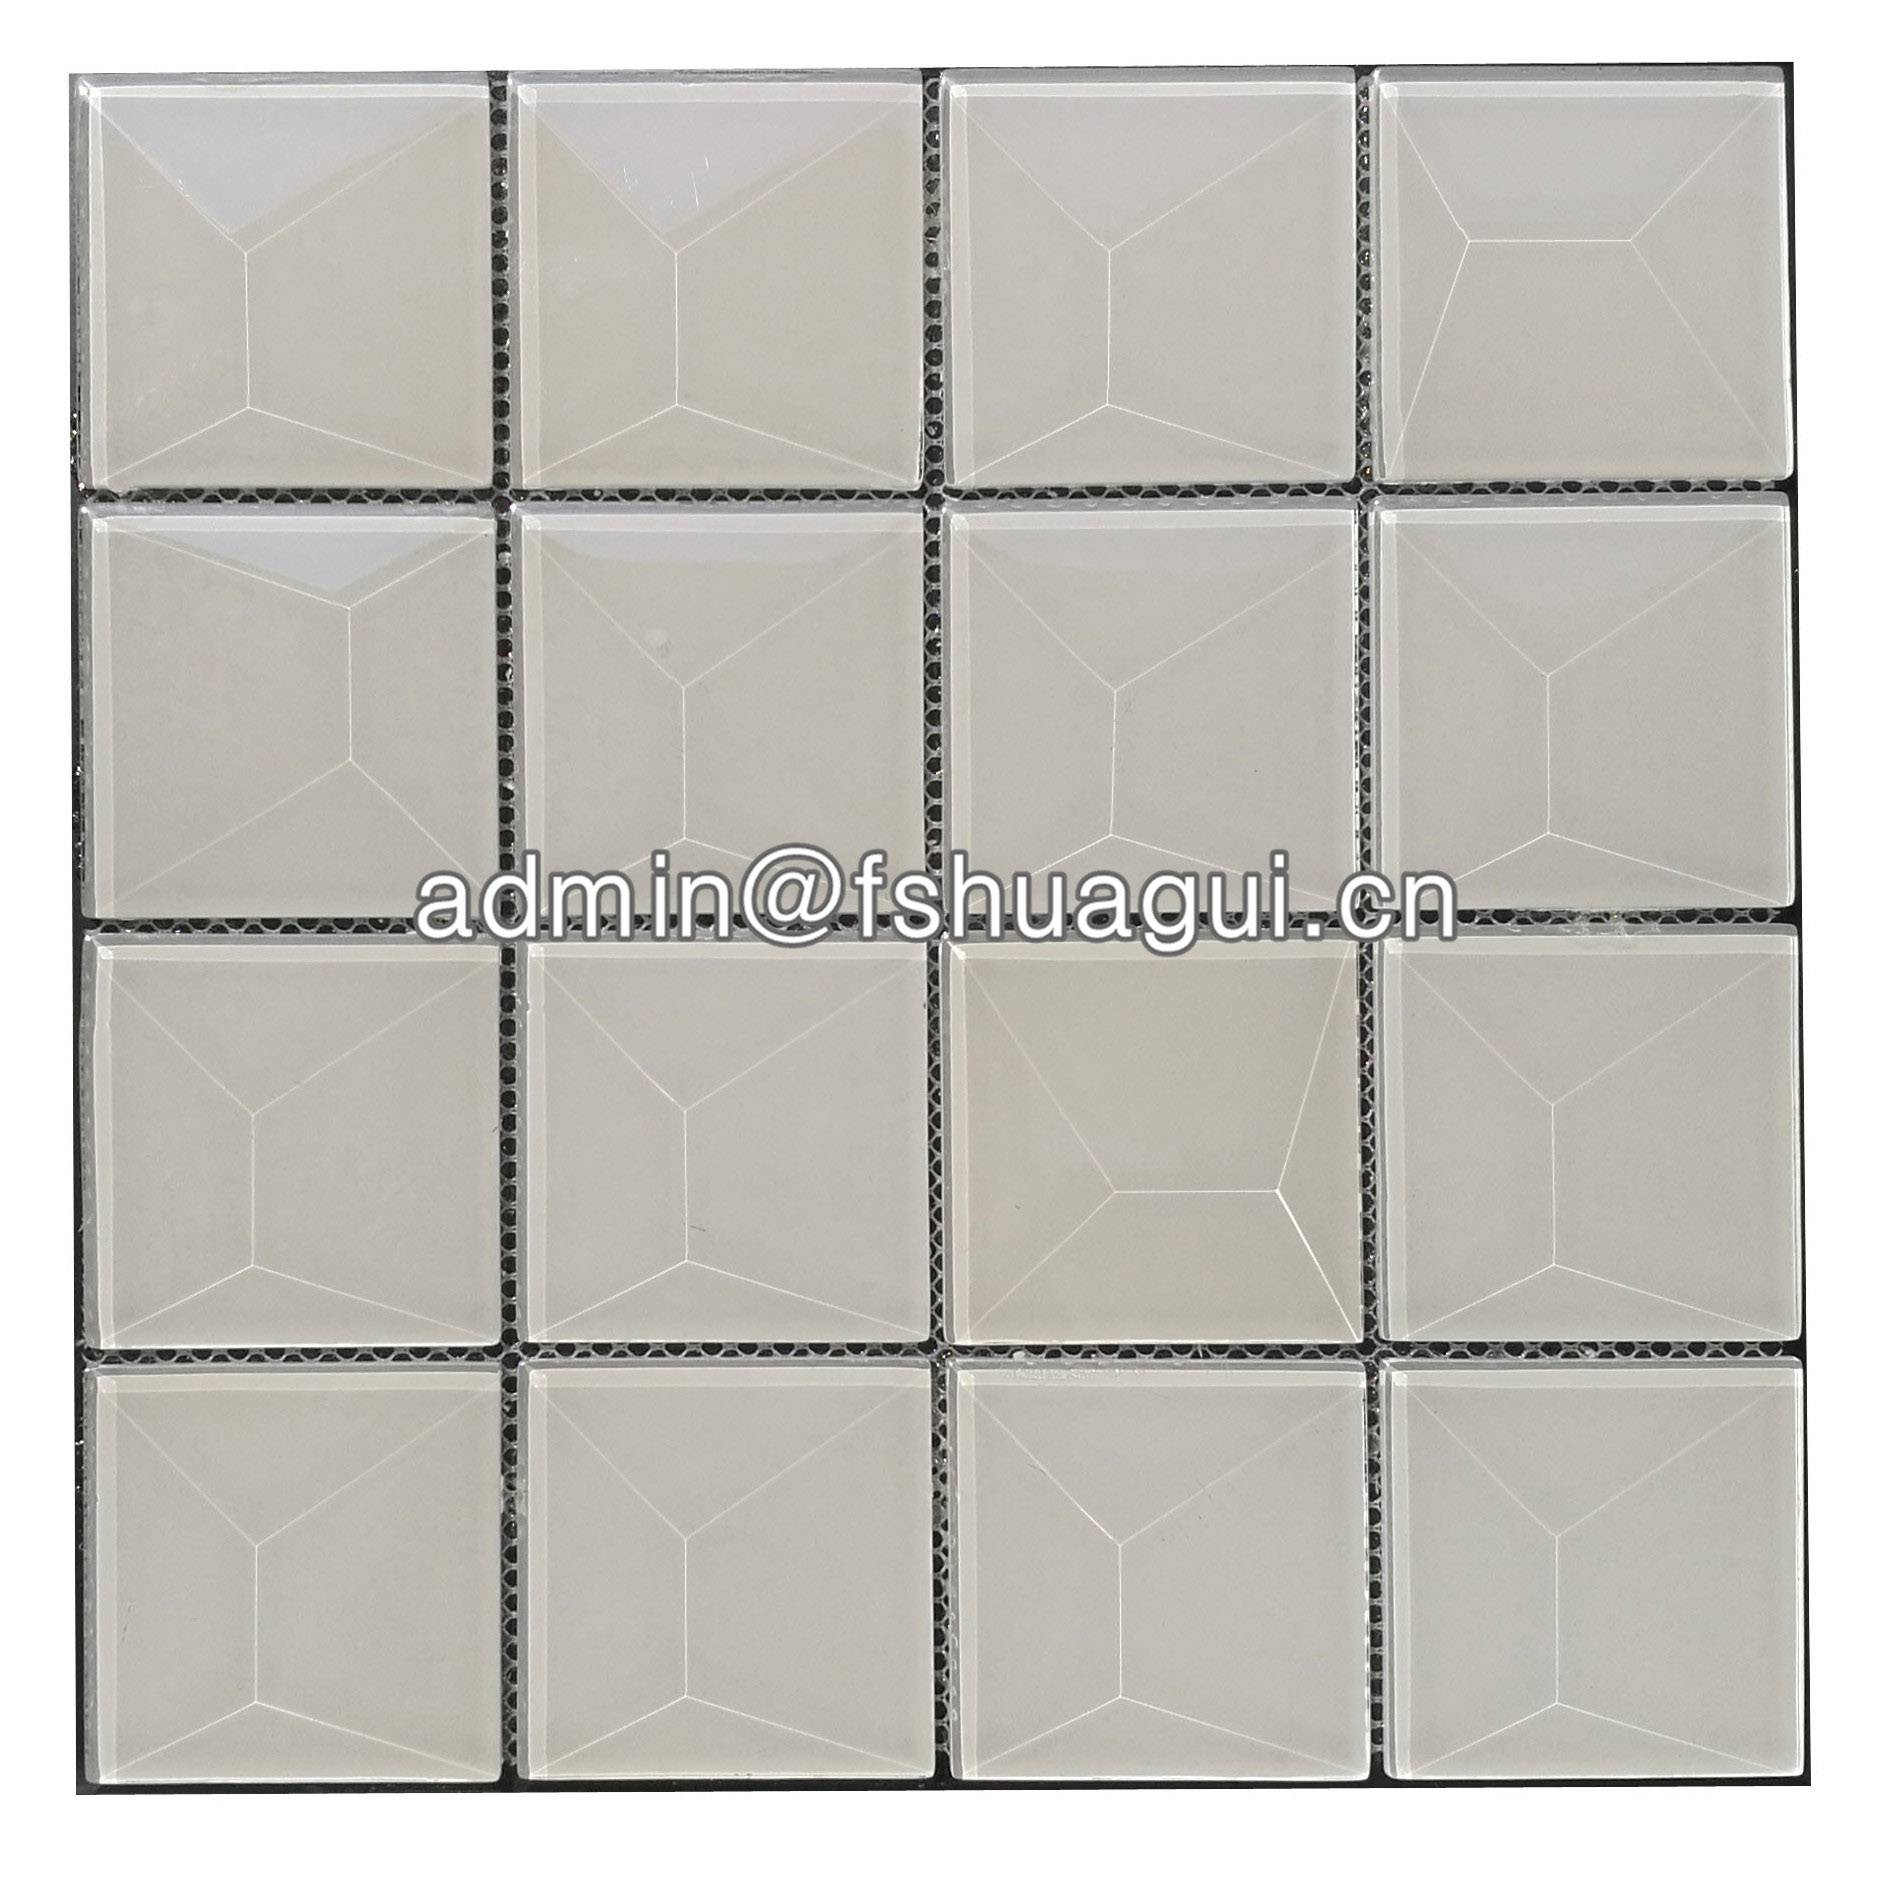 Huagui Popular 3 inch pure snow white beveled glass tile HG-WJ412 GLASS SUBWAY TILE image1